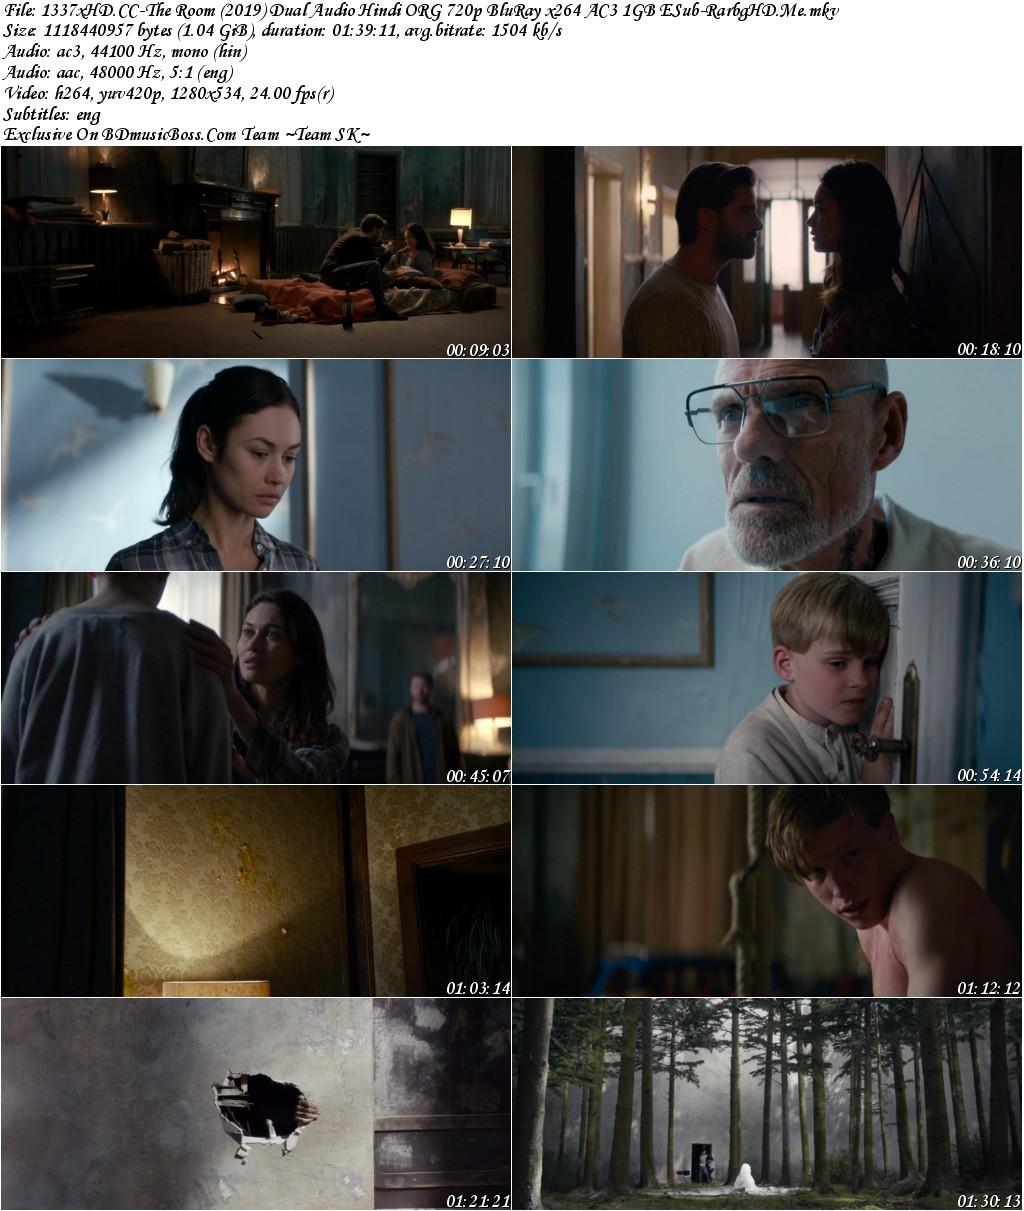 1337x-HD-CC-The-Room-2019-Dual-Audio-Hindi-ORG-720p-Blu-Ray-x264-AC3-1-GB-ESub-Rarbg-HD-Me-s